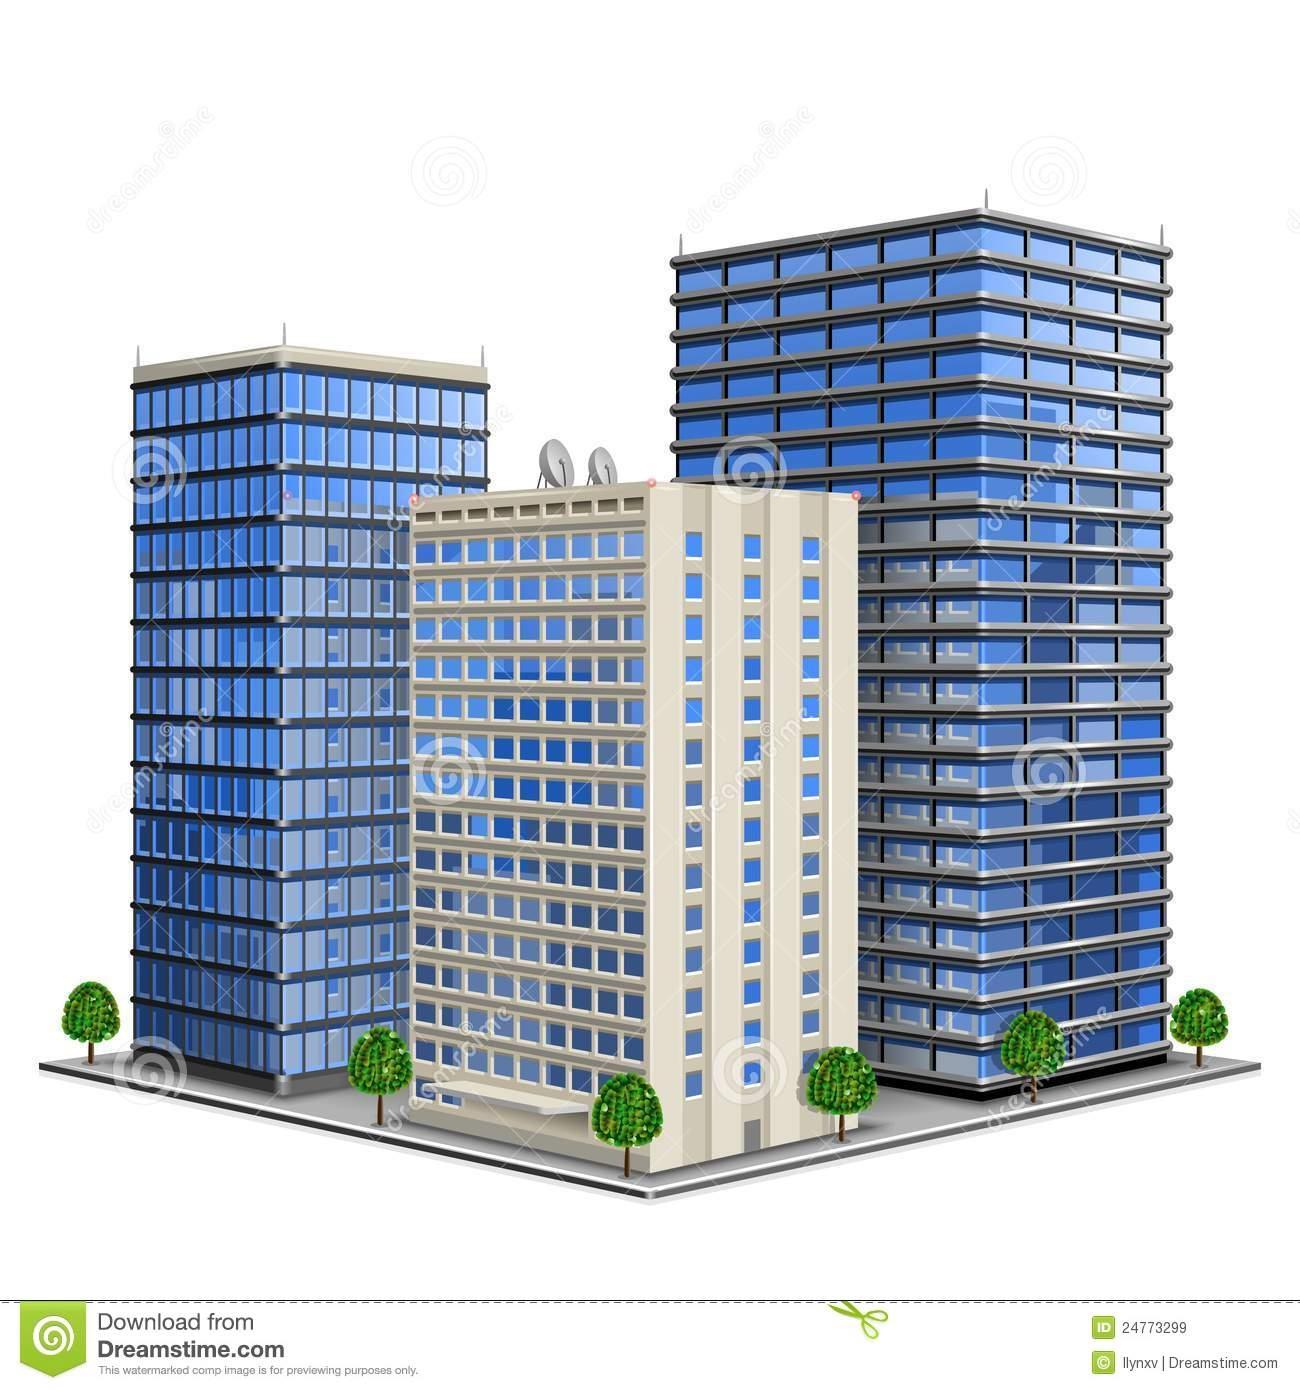 Towers business building pencil. Buildings clipart headquarters